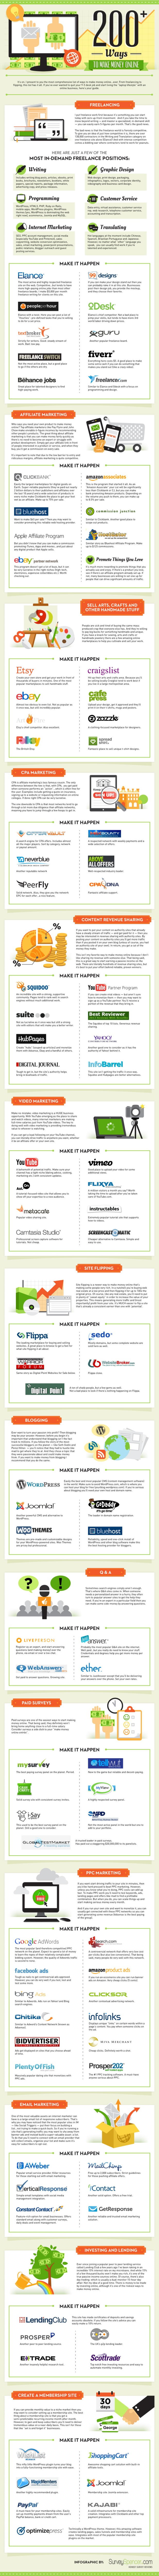 200 ways to make money online_infographic